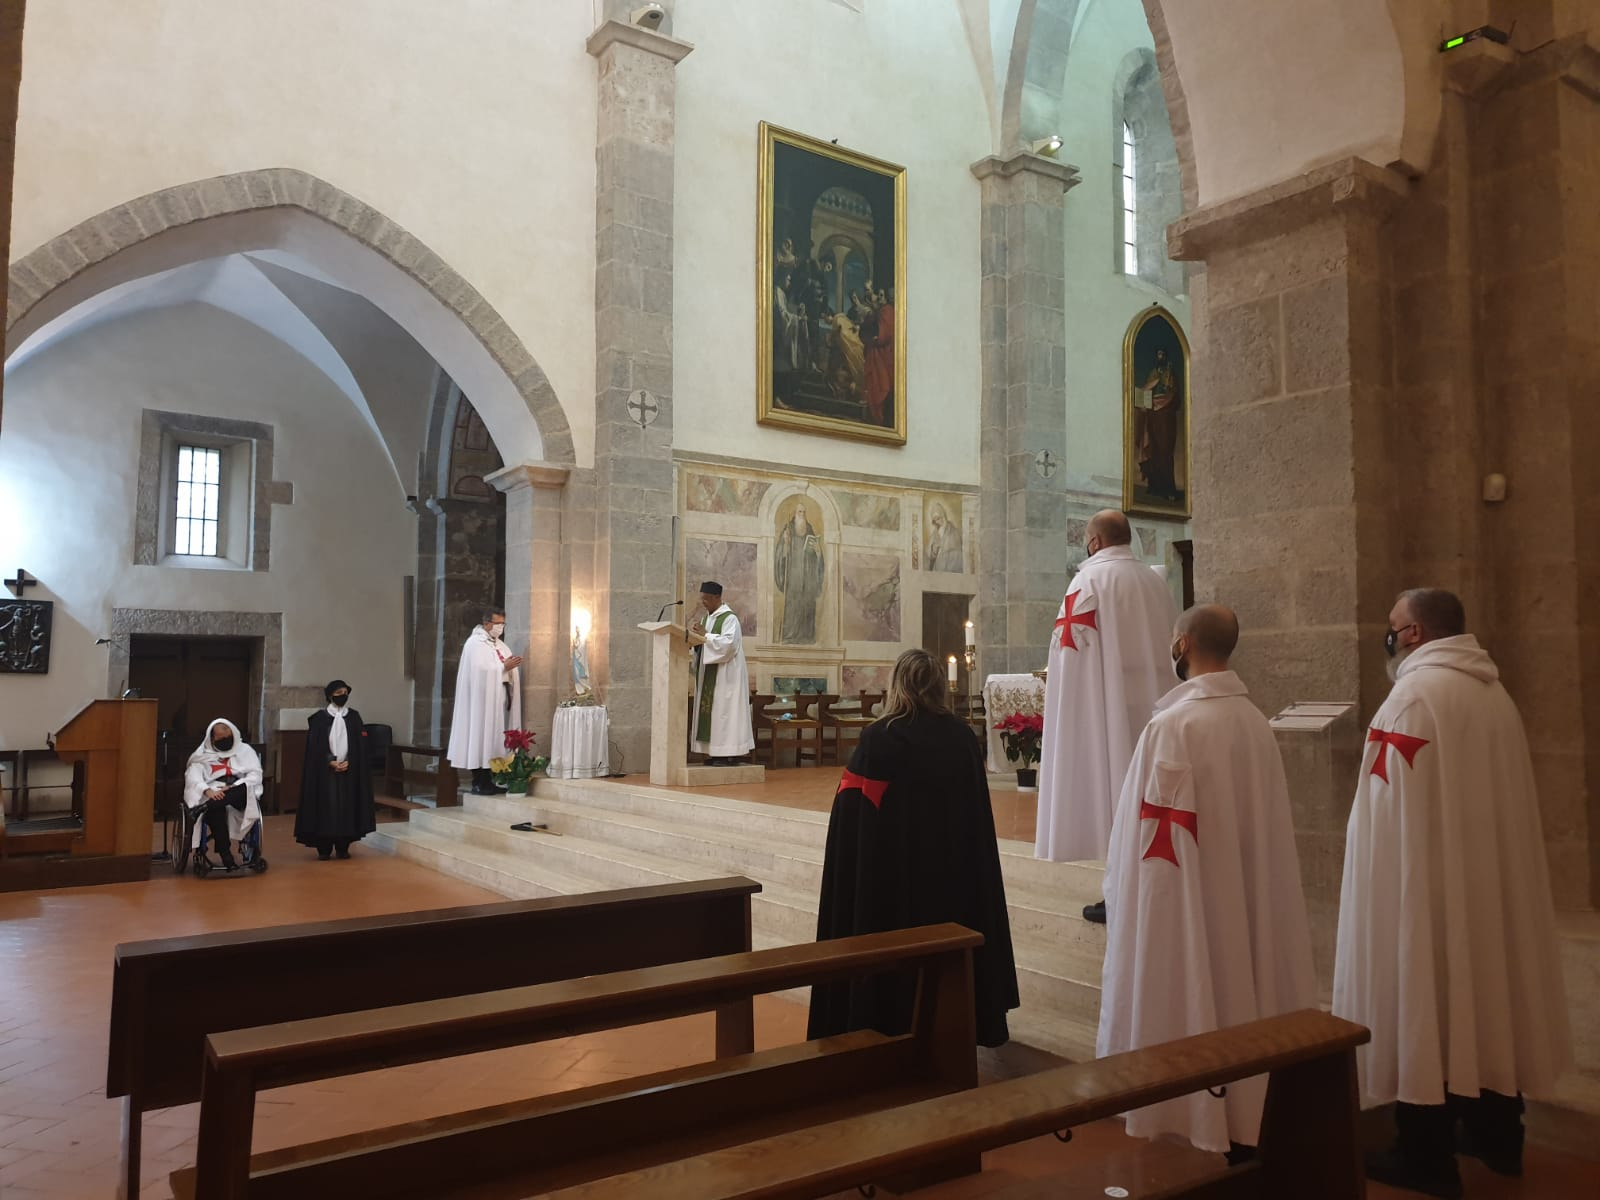 Kustodieverschiebung Abteikirche Valvisciolo und Kirche Madonna del Fossato – Sermoneta(LT) 24.01.2021